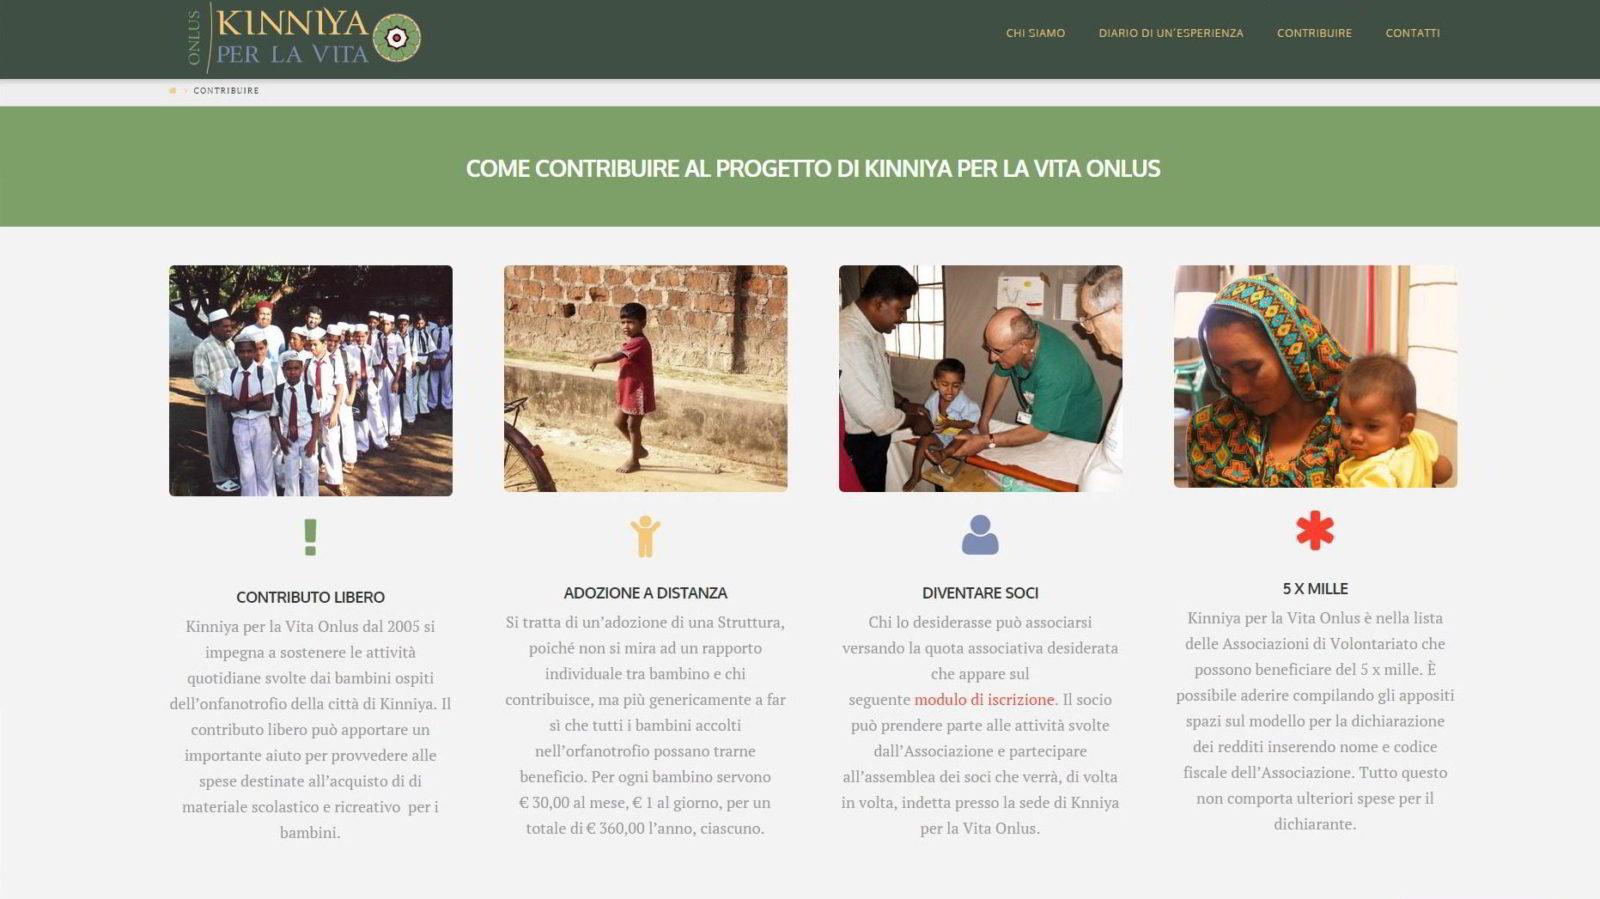 Web site Kinniya per la Vita ONLUS - Memory Slash Vision studios